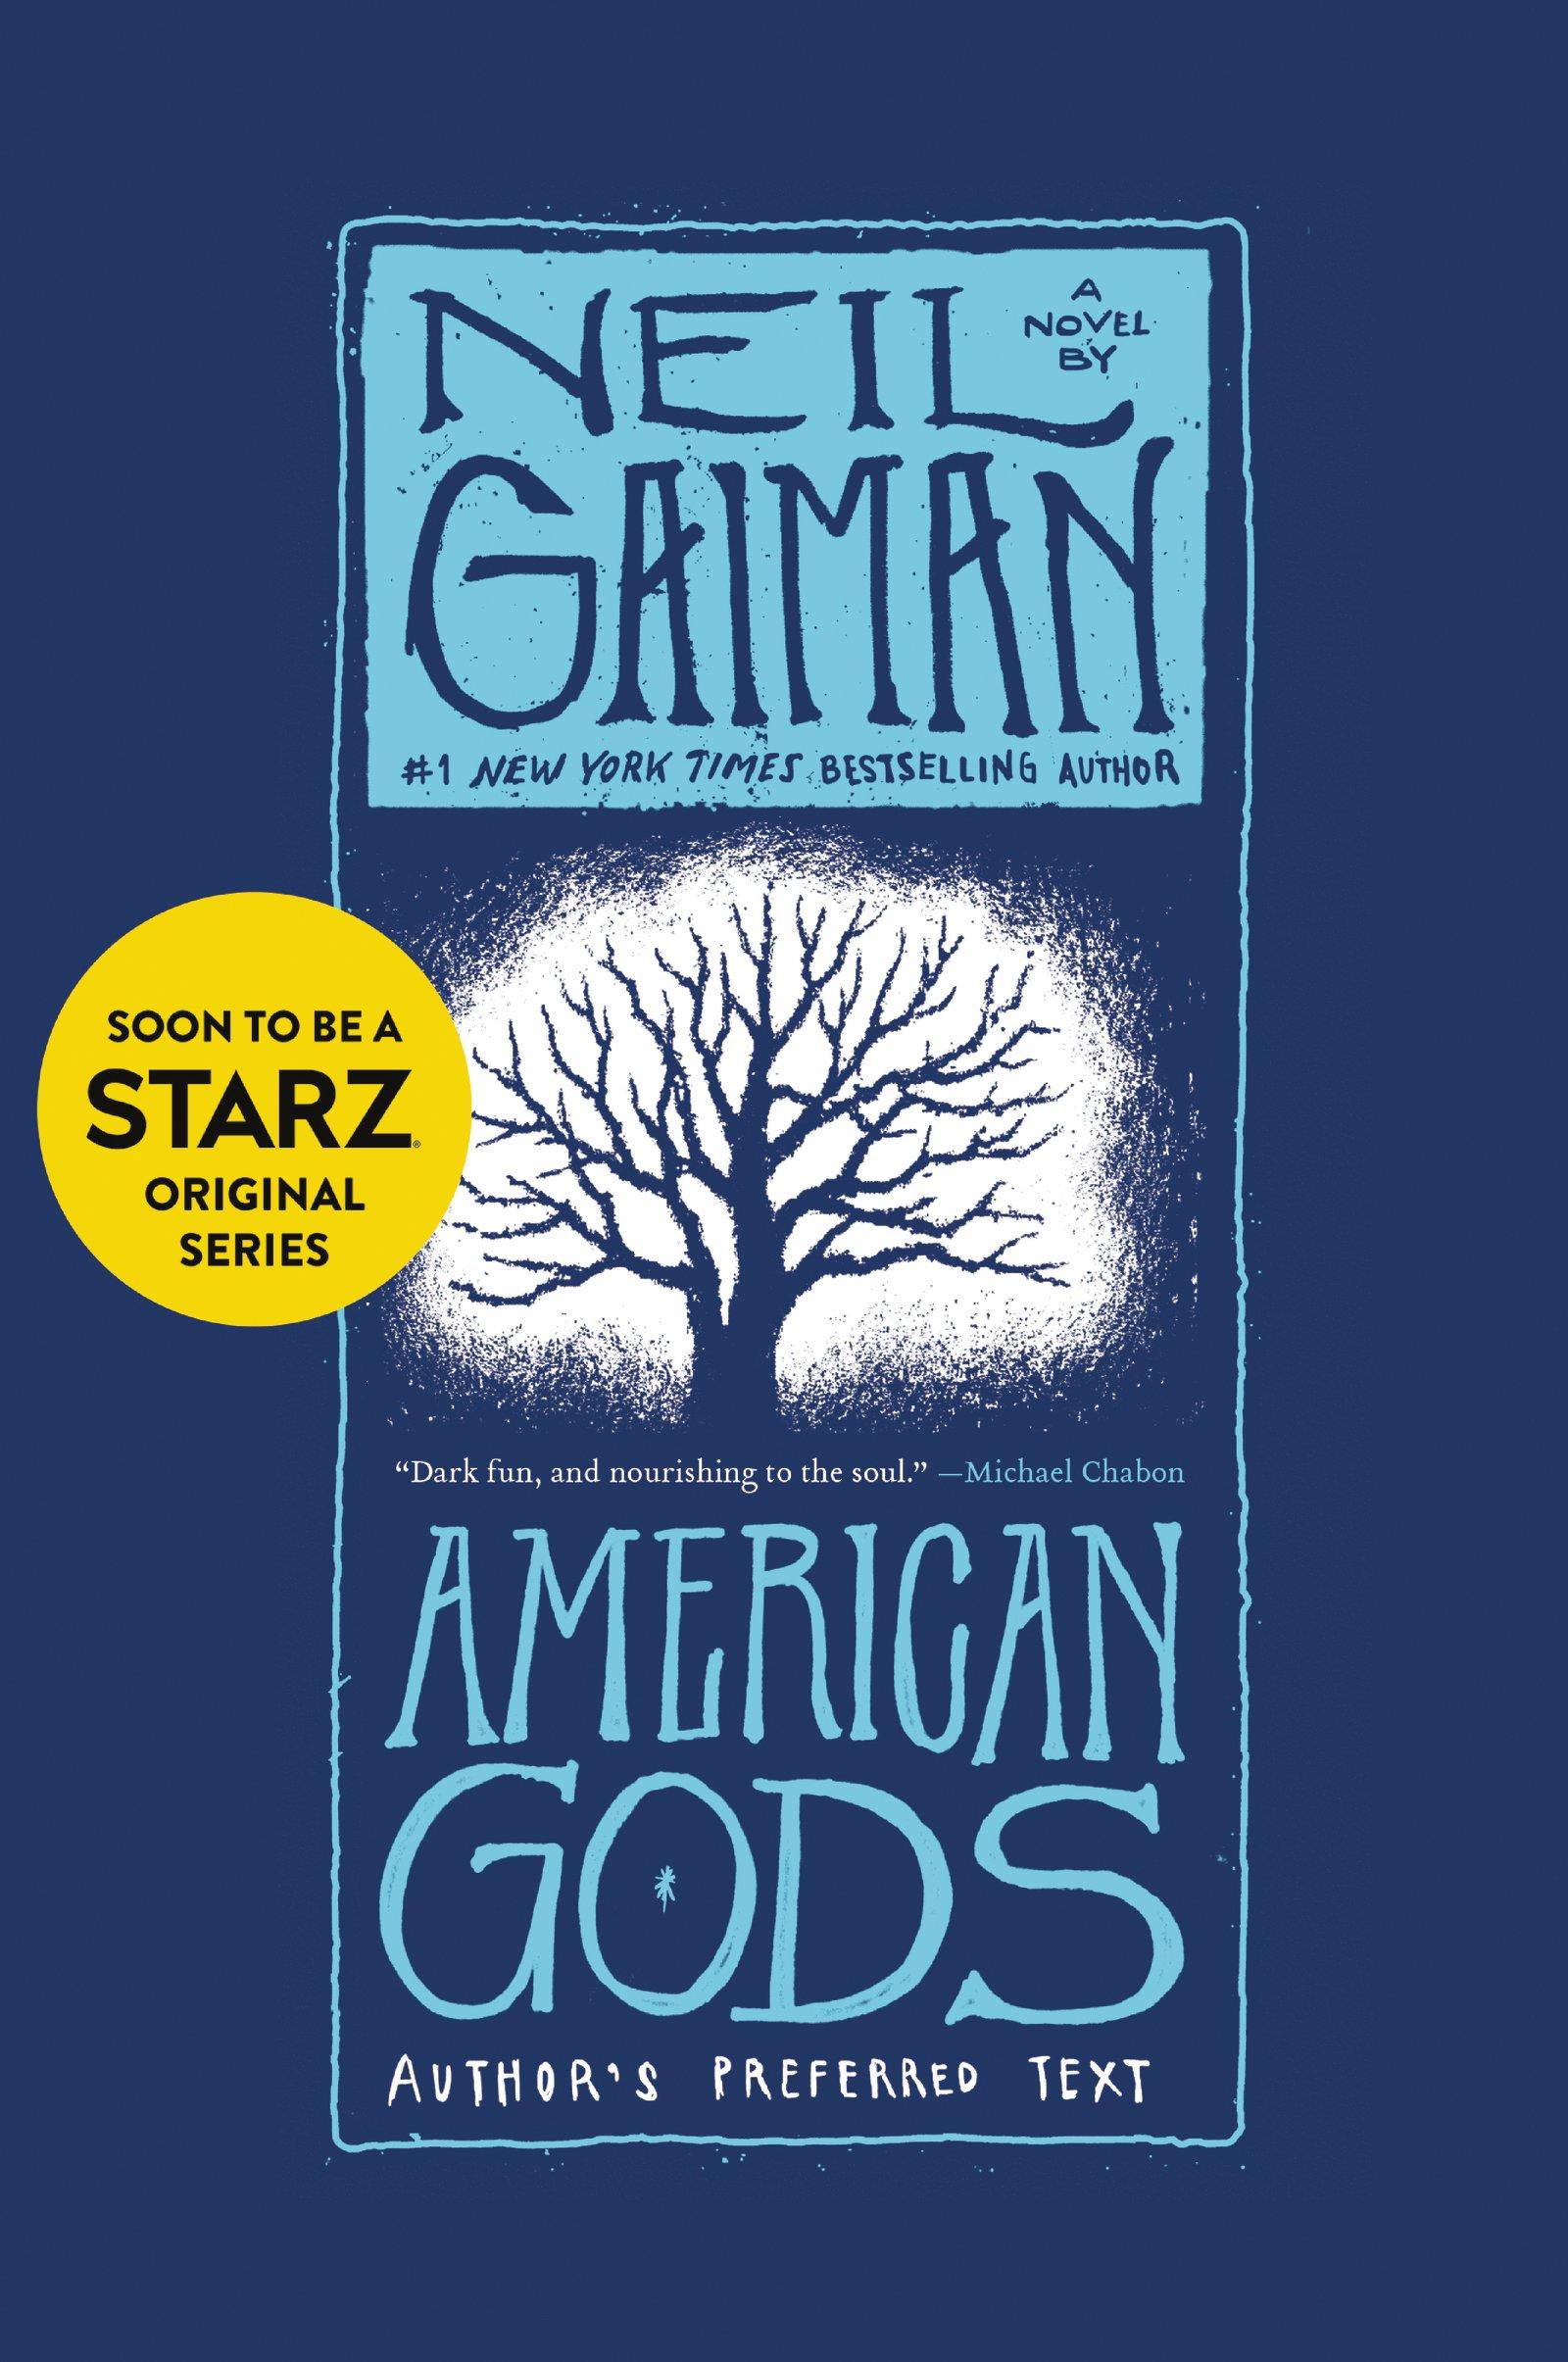 Amazon: American Gods: Author's Preferred Text (9780062080233): Neil  Gaiman: Books